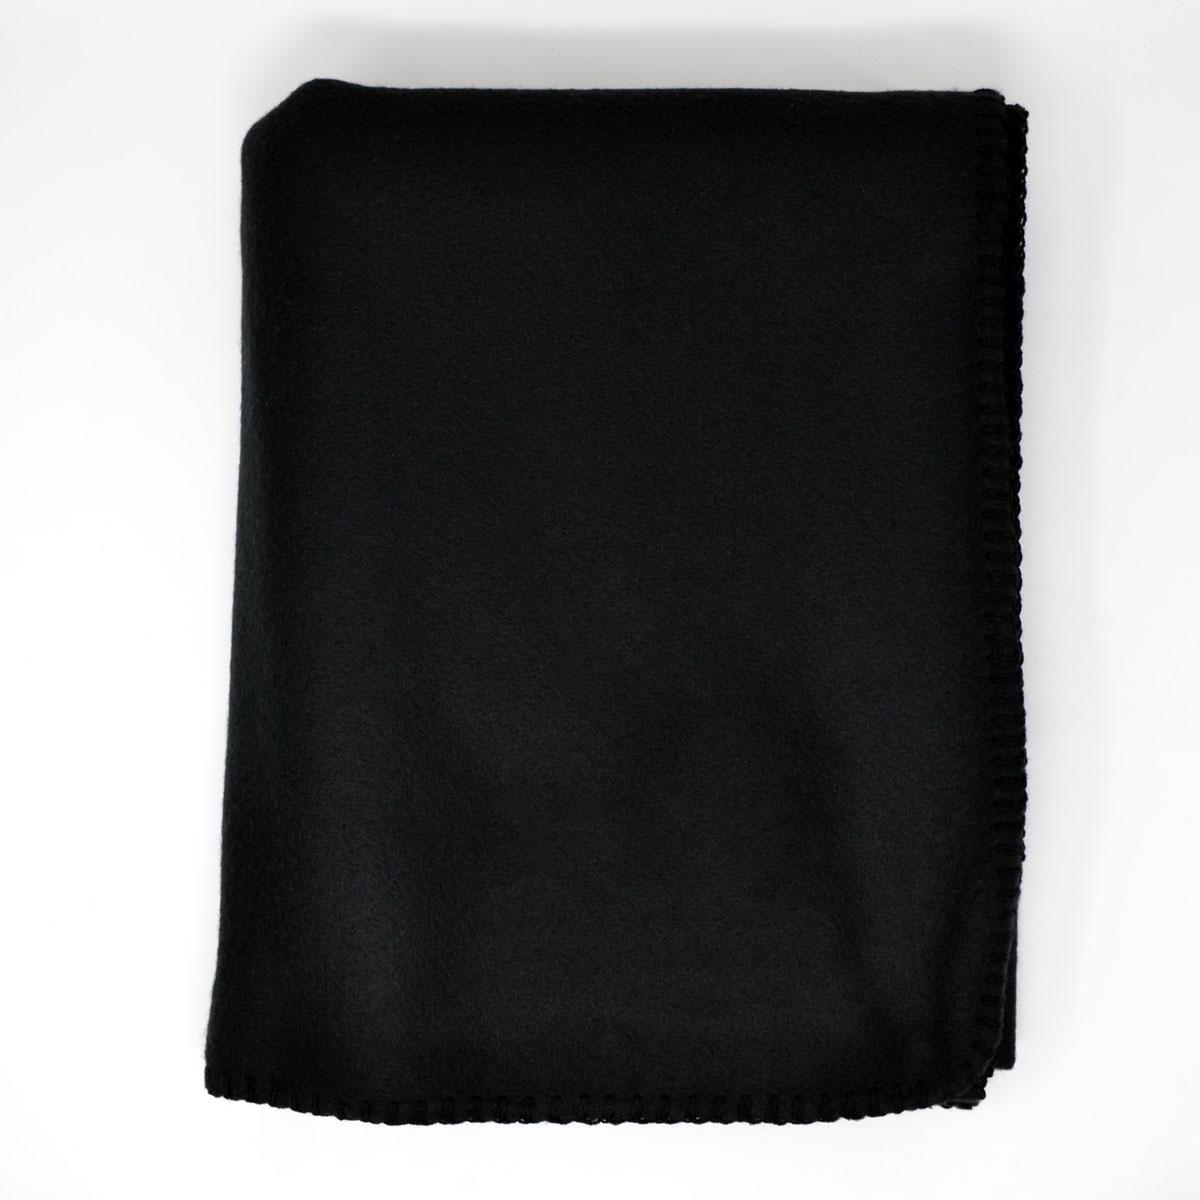 FleecePro-Black-Blank